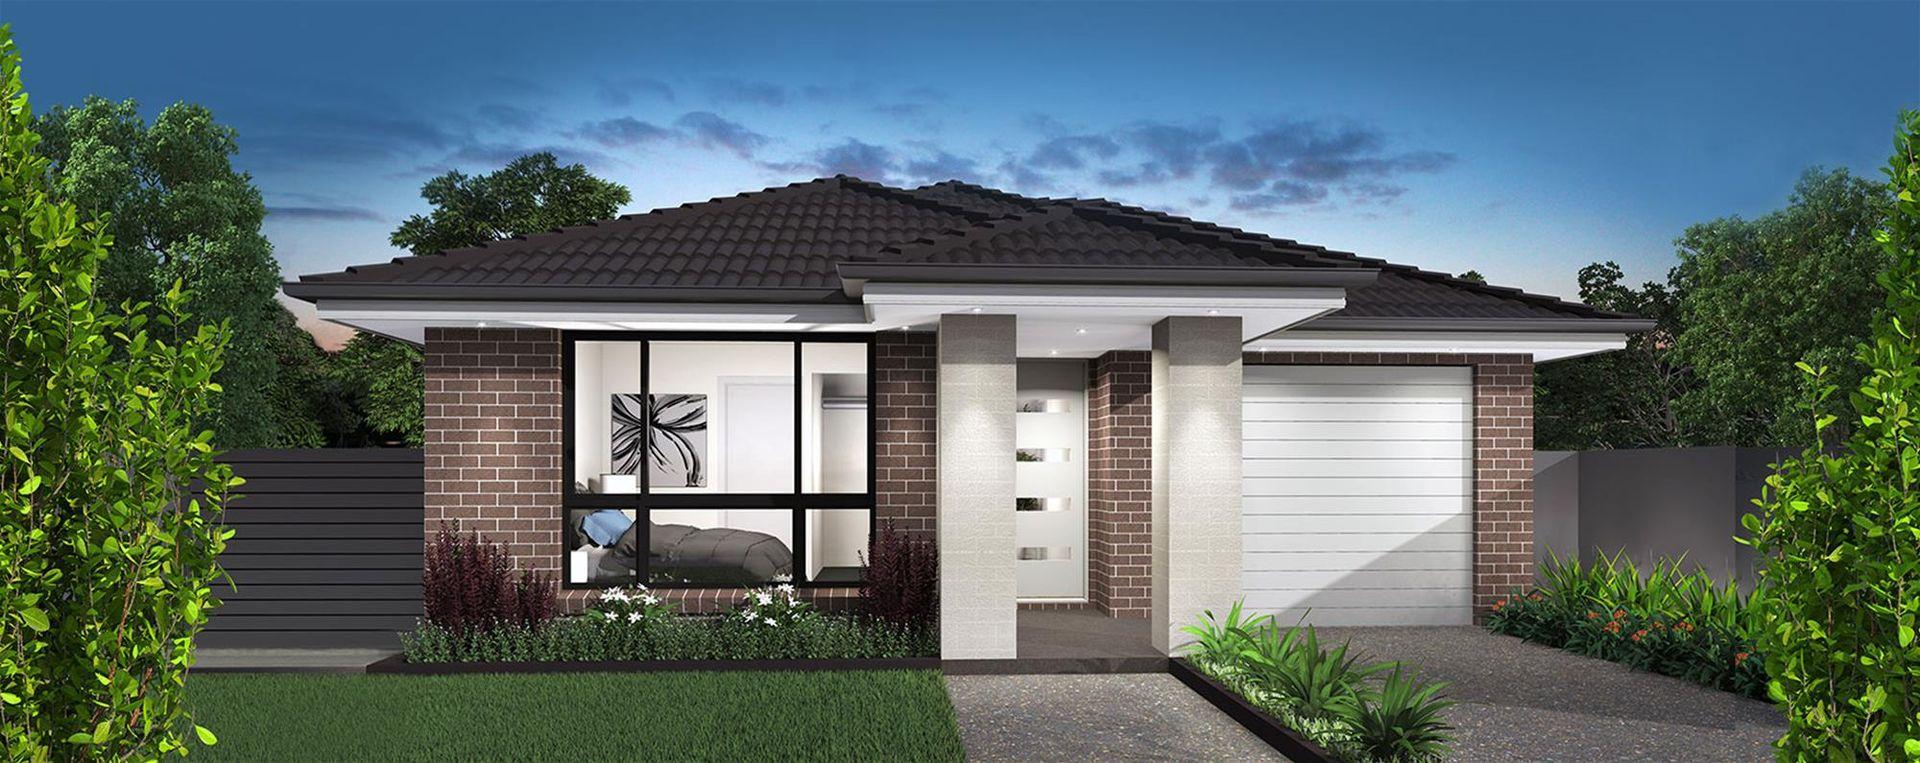 Lot 4055 Oran Park Town, Oran Park NSW 2570, Image 0